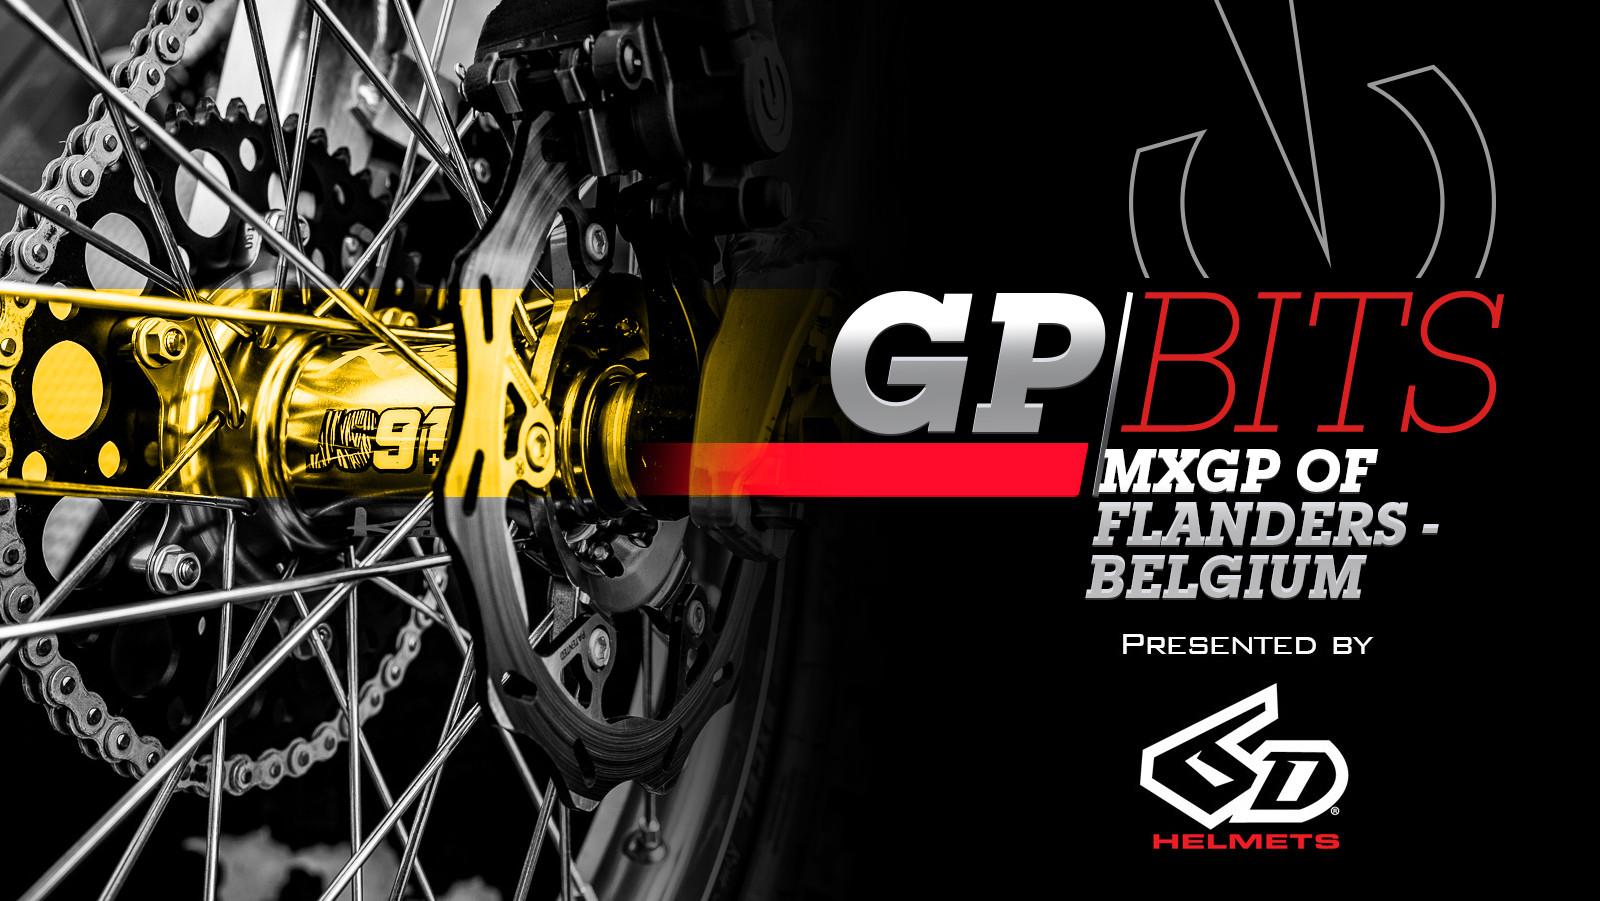 GP Bits: MXGP of Flanders - Belgium